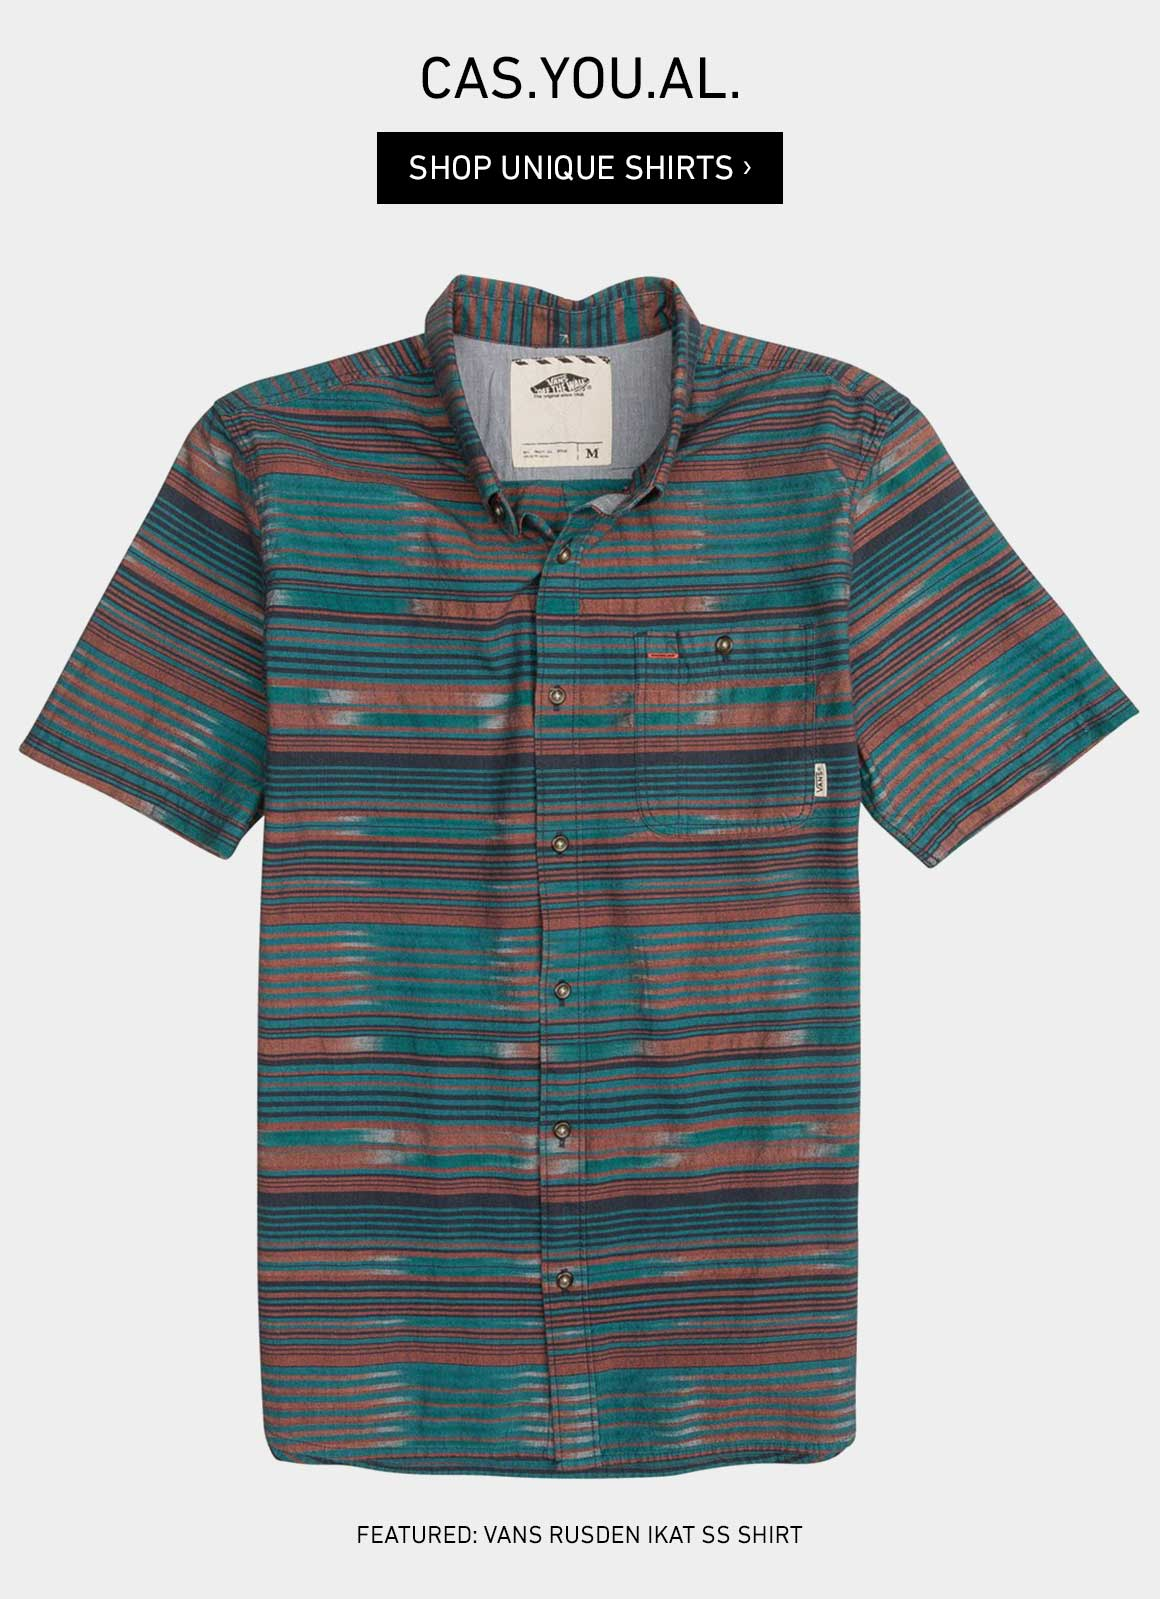 Keep It Casual: Shop New Unique Shirts